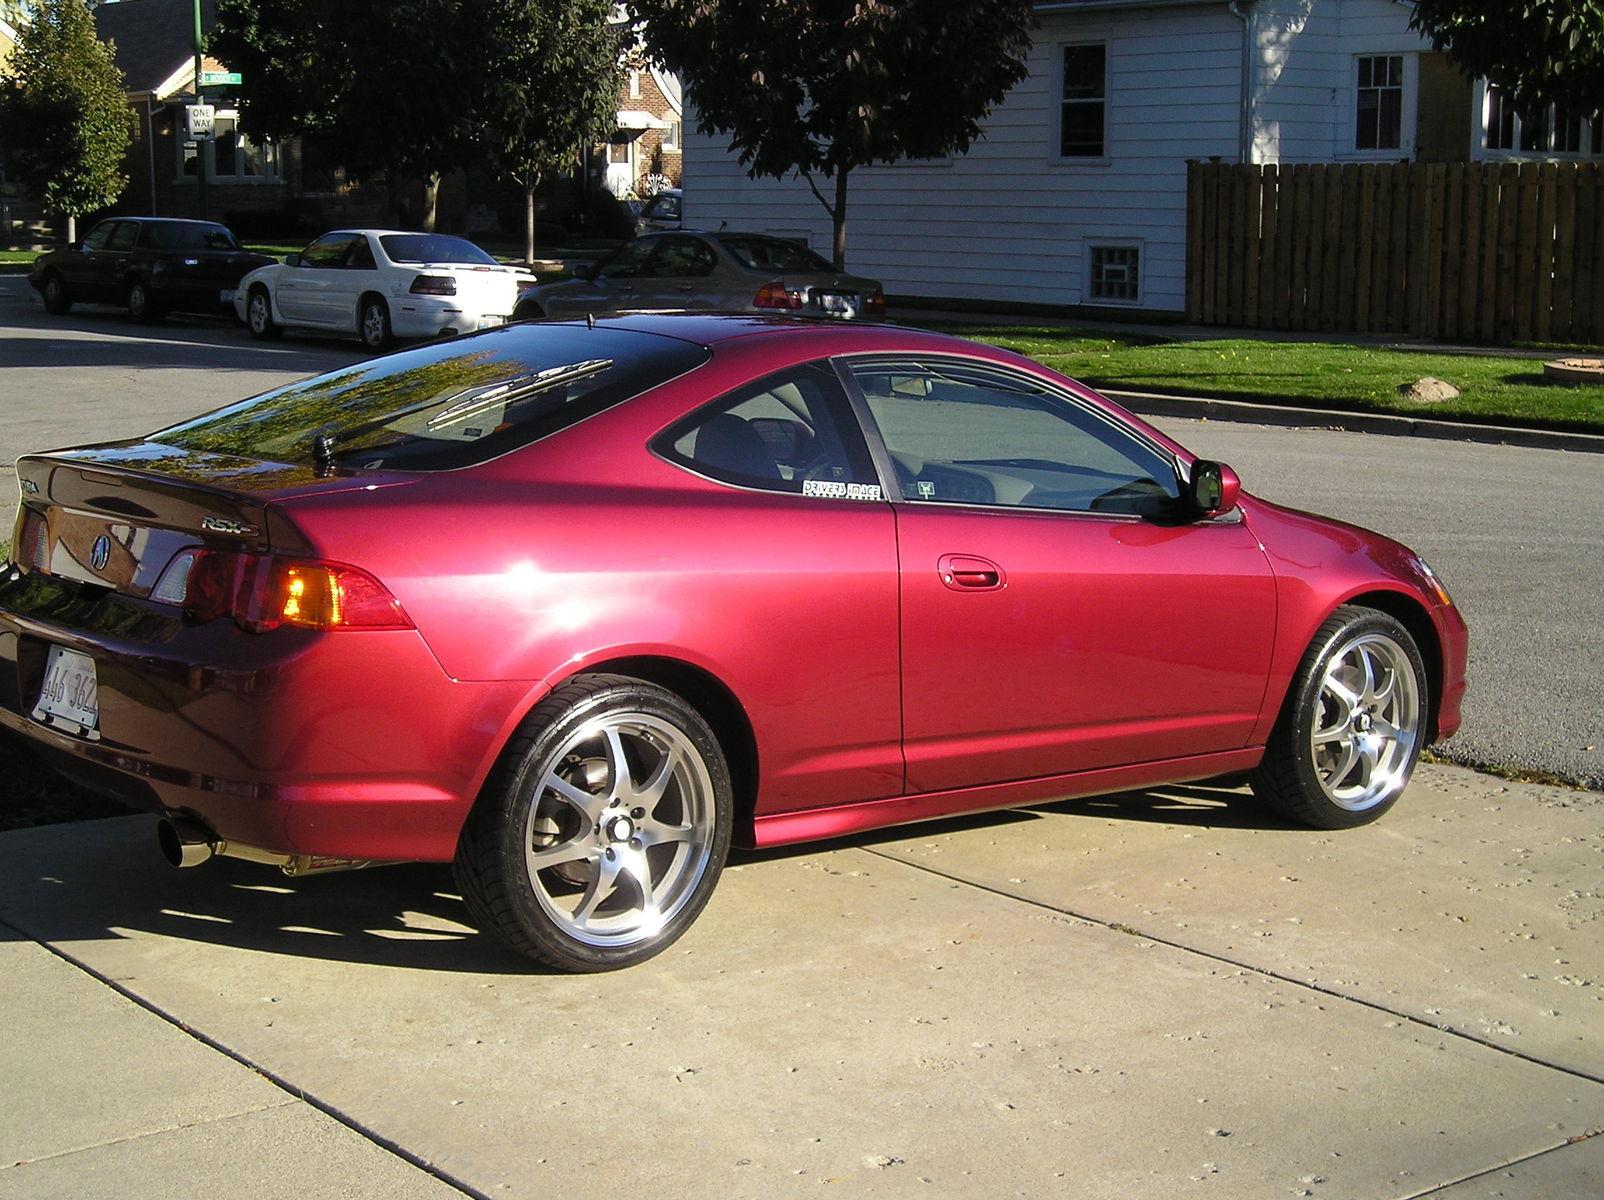 2003 Acura RSX   Acura RSX Type S